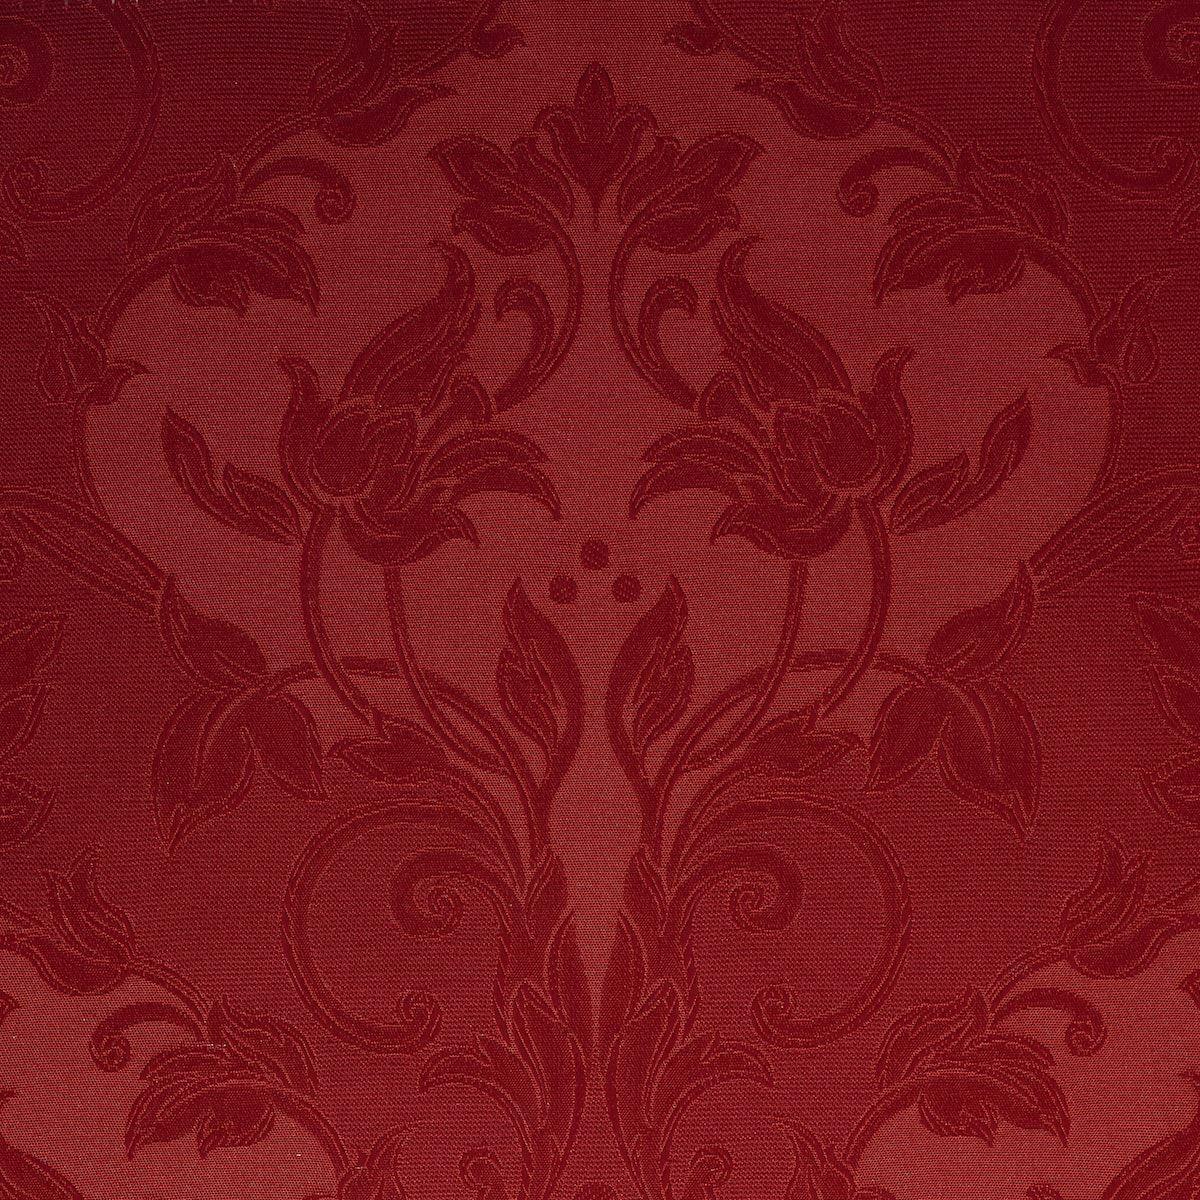 Damask Cross H Cm 160 63 Inch Silk Blend Fabric Red For Liturgical Vestments Vaticanum Com